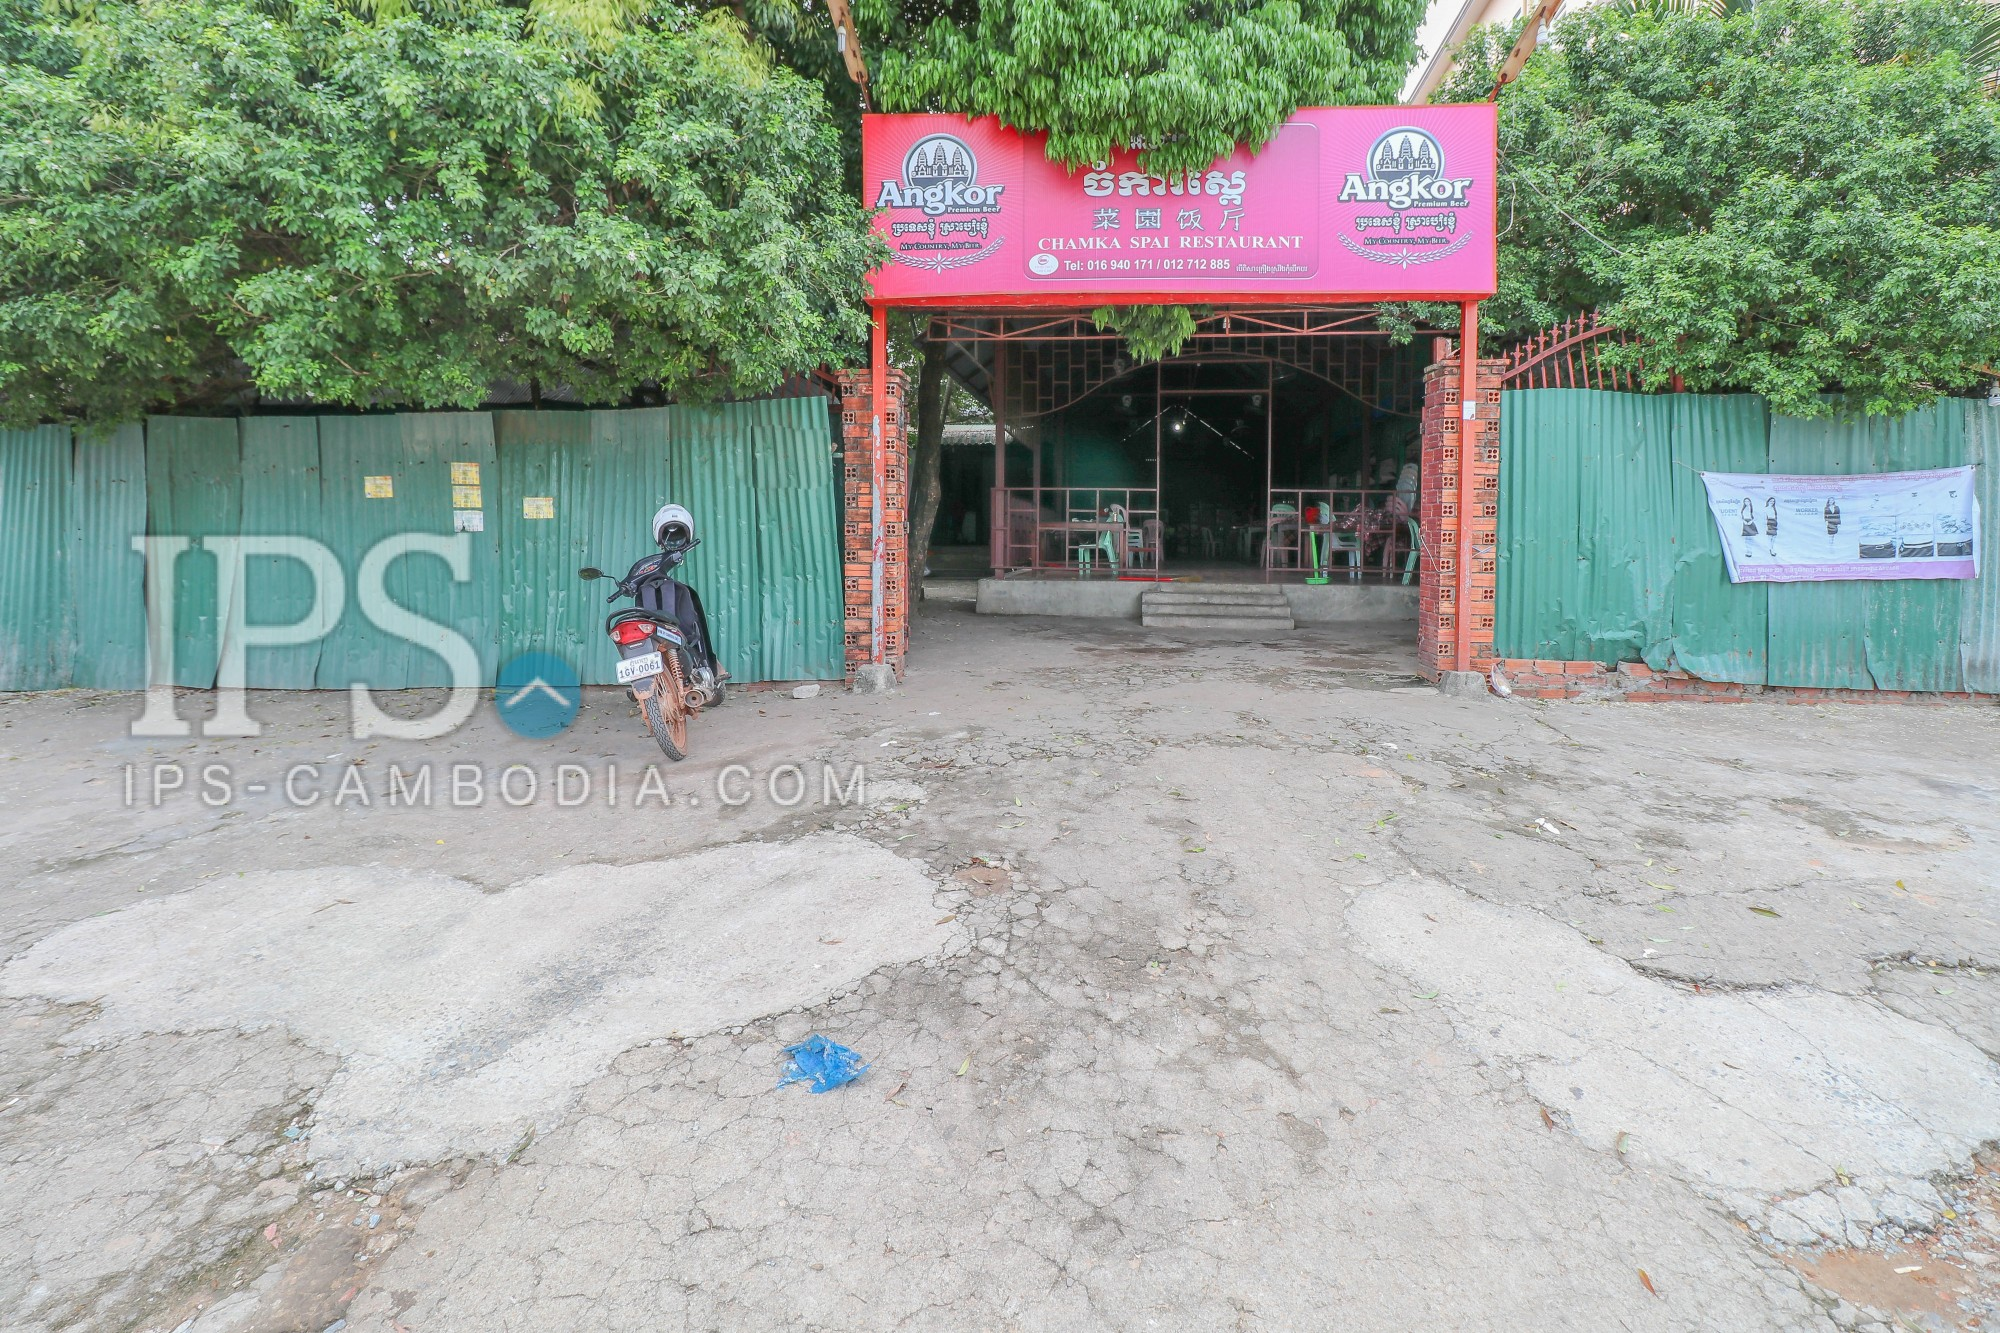 570 Sqm Land And Restaurant for Sale - Golden Lions Roundabout, Sihanoukville